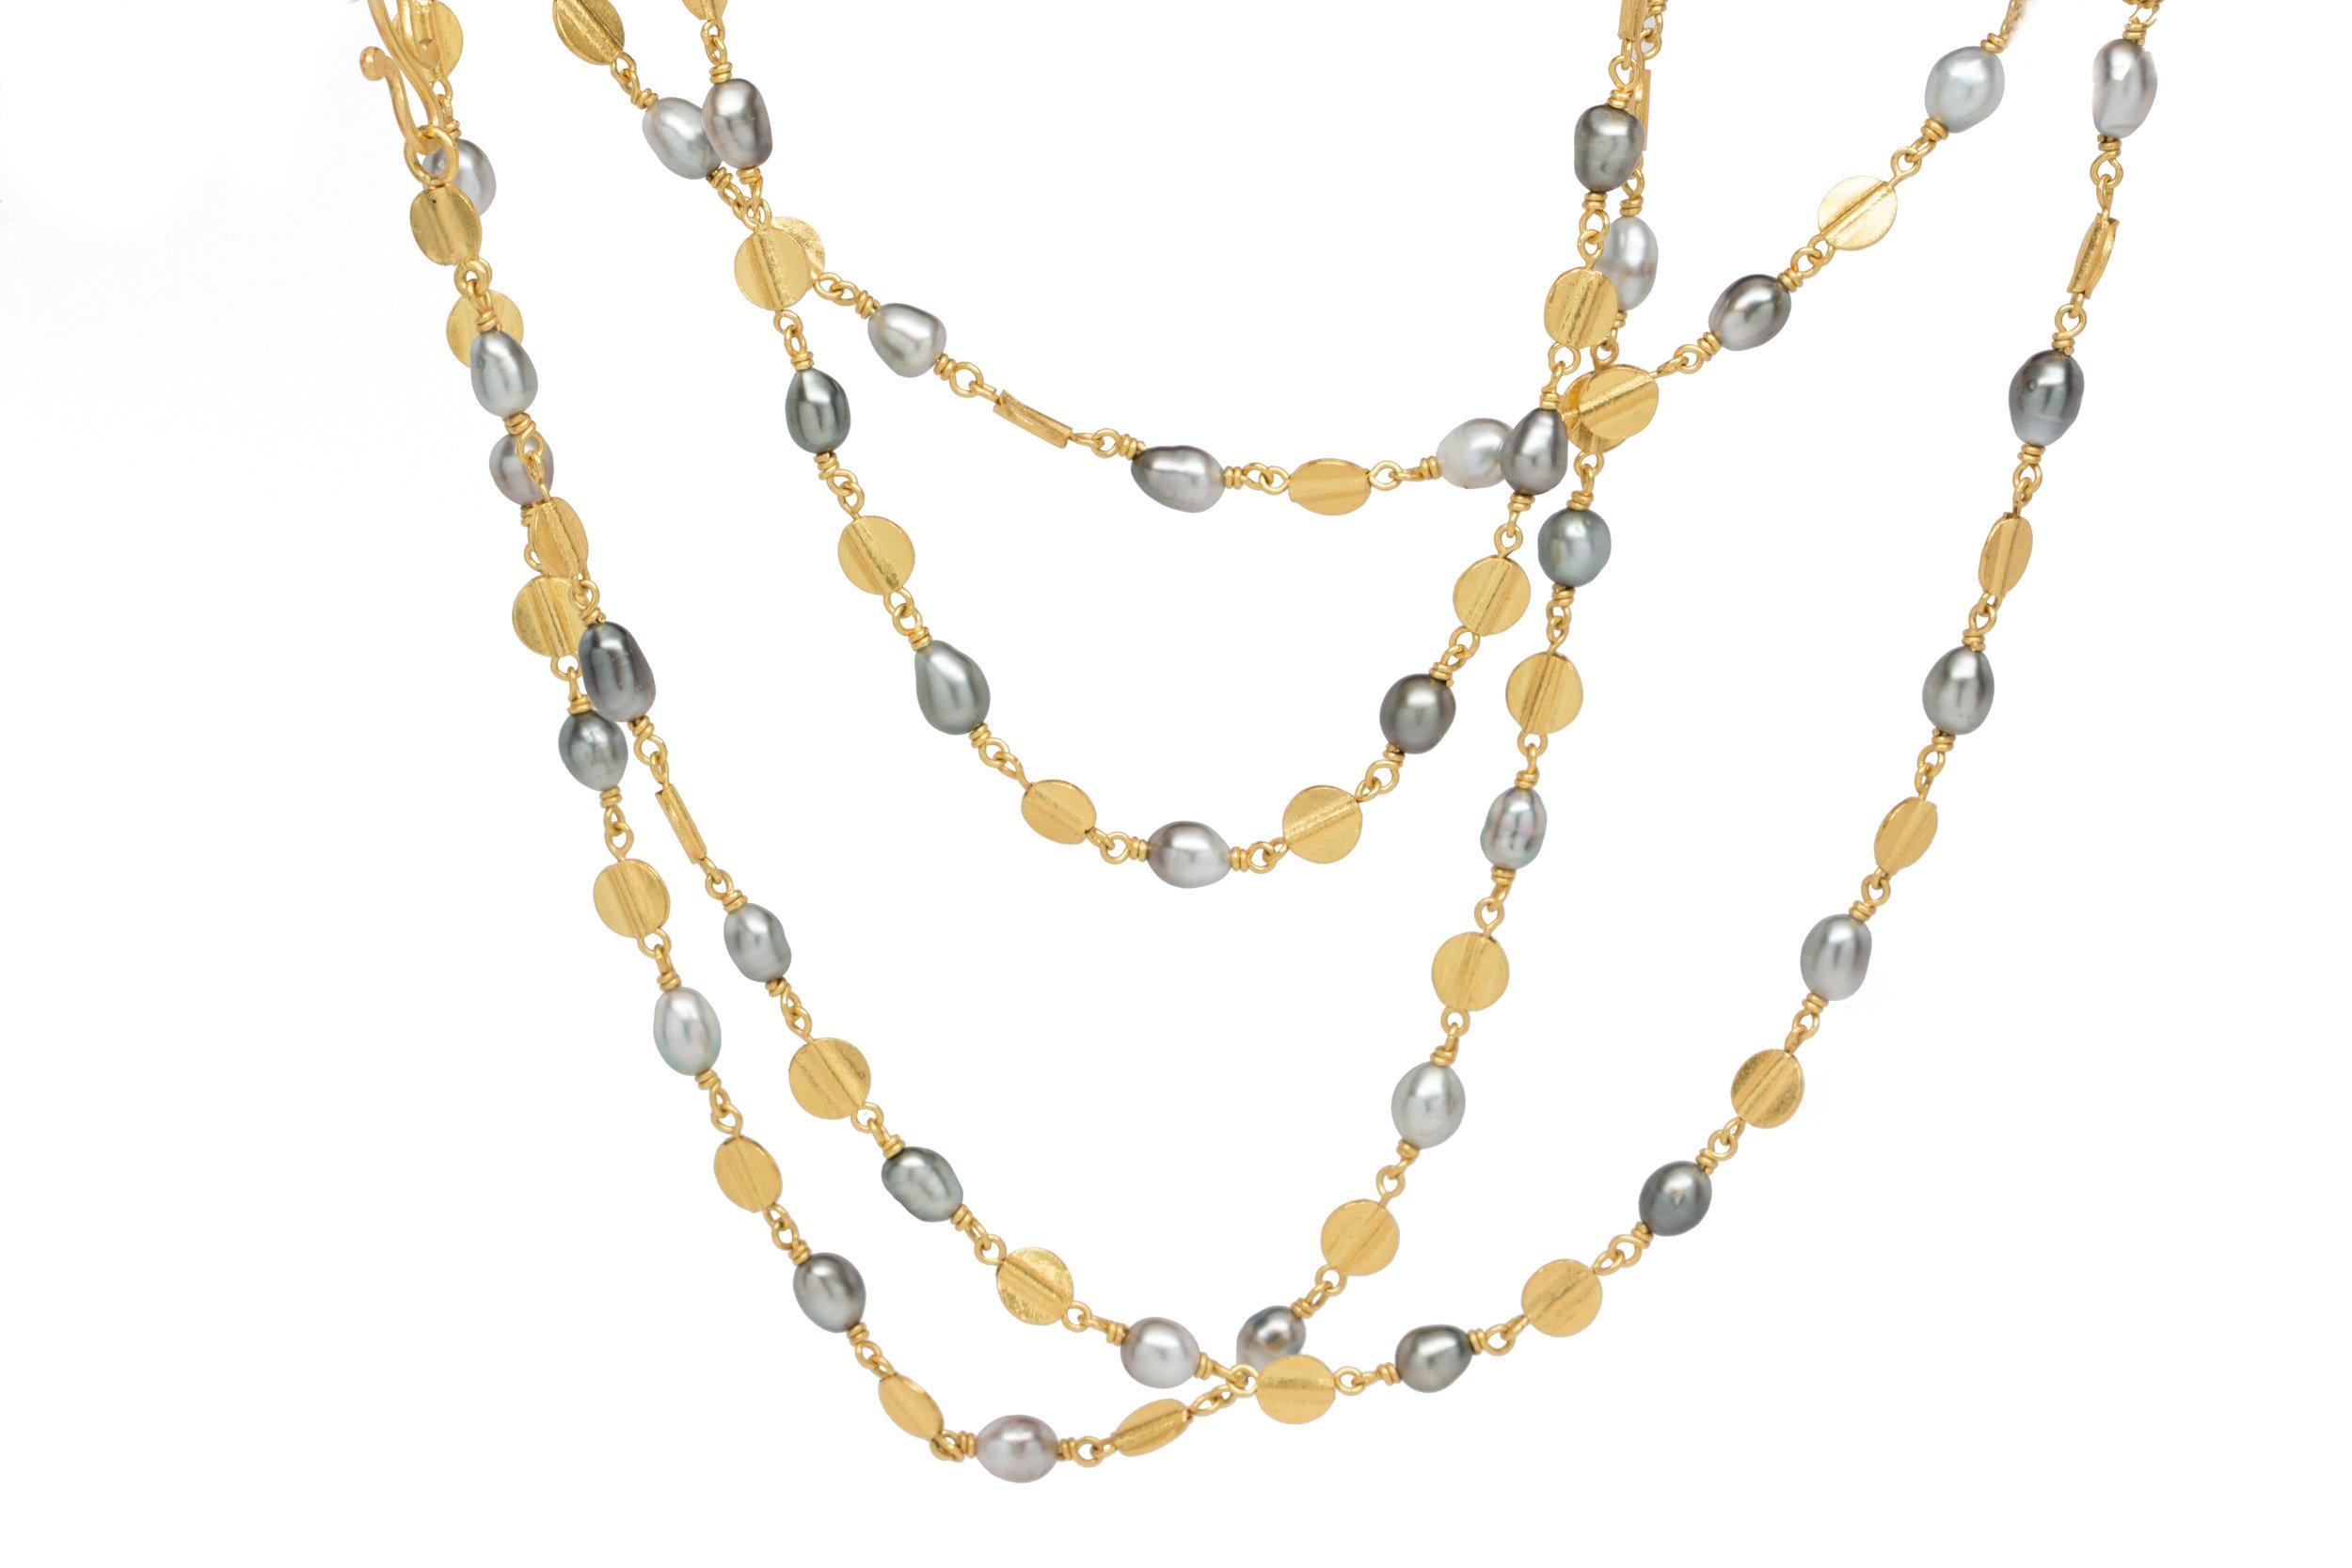 dec20 jewelry4-493.jpg